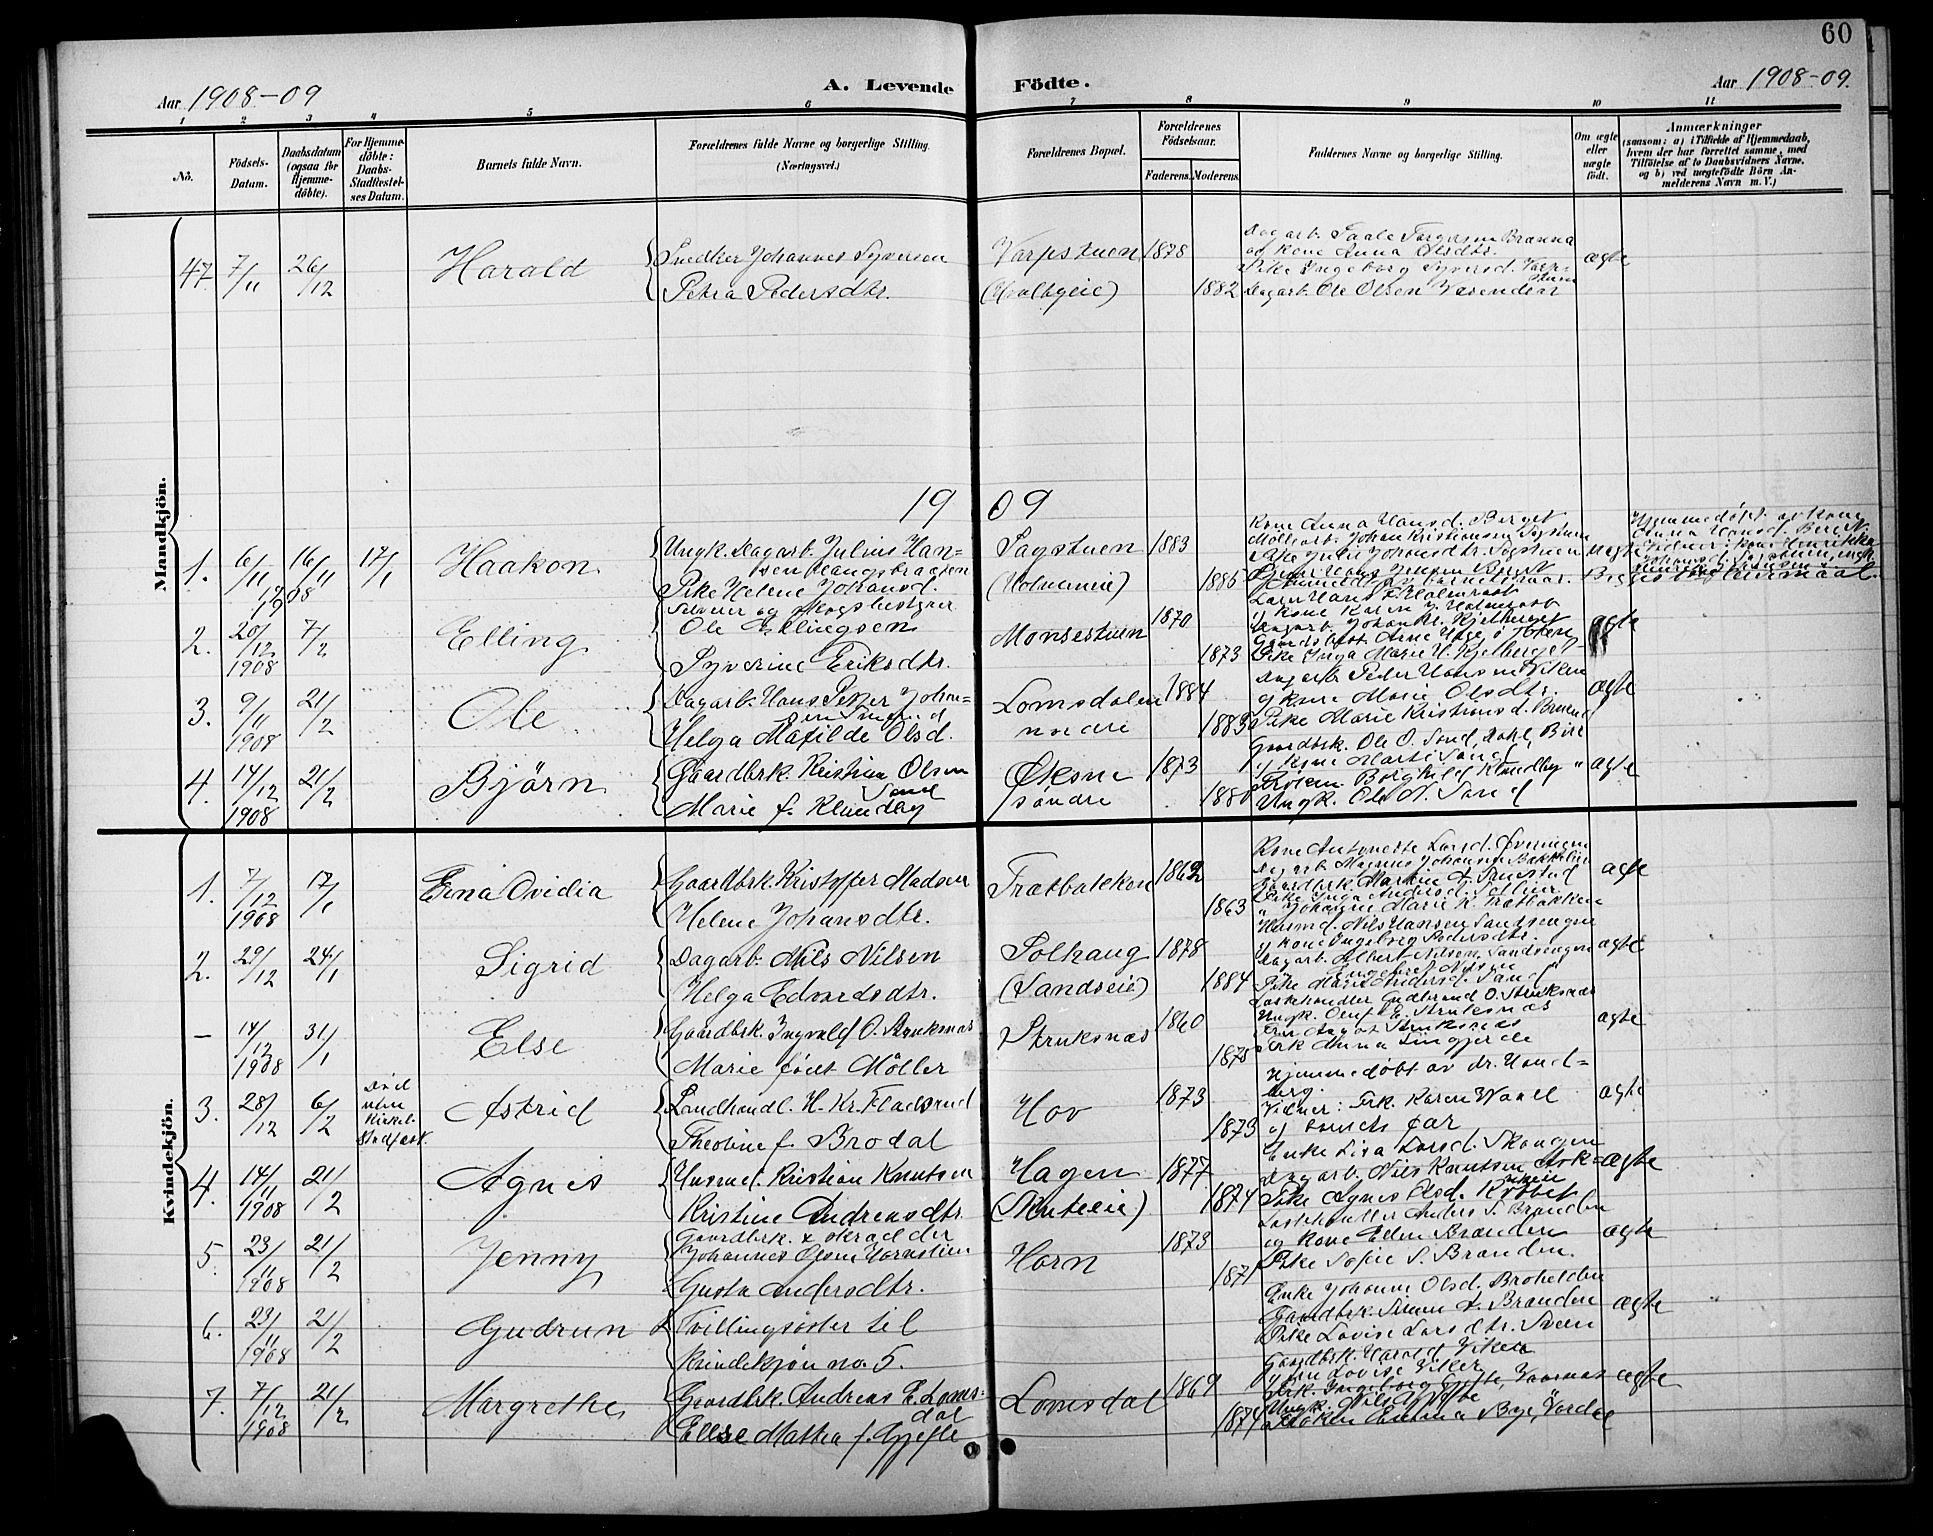 SAH, Søndre Land prestekontor, L/L0004: Klokkerbok nr. 4, 1901-1915, s. 60